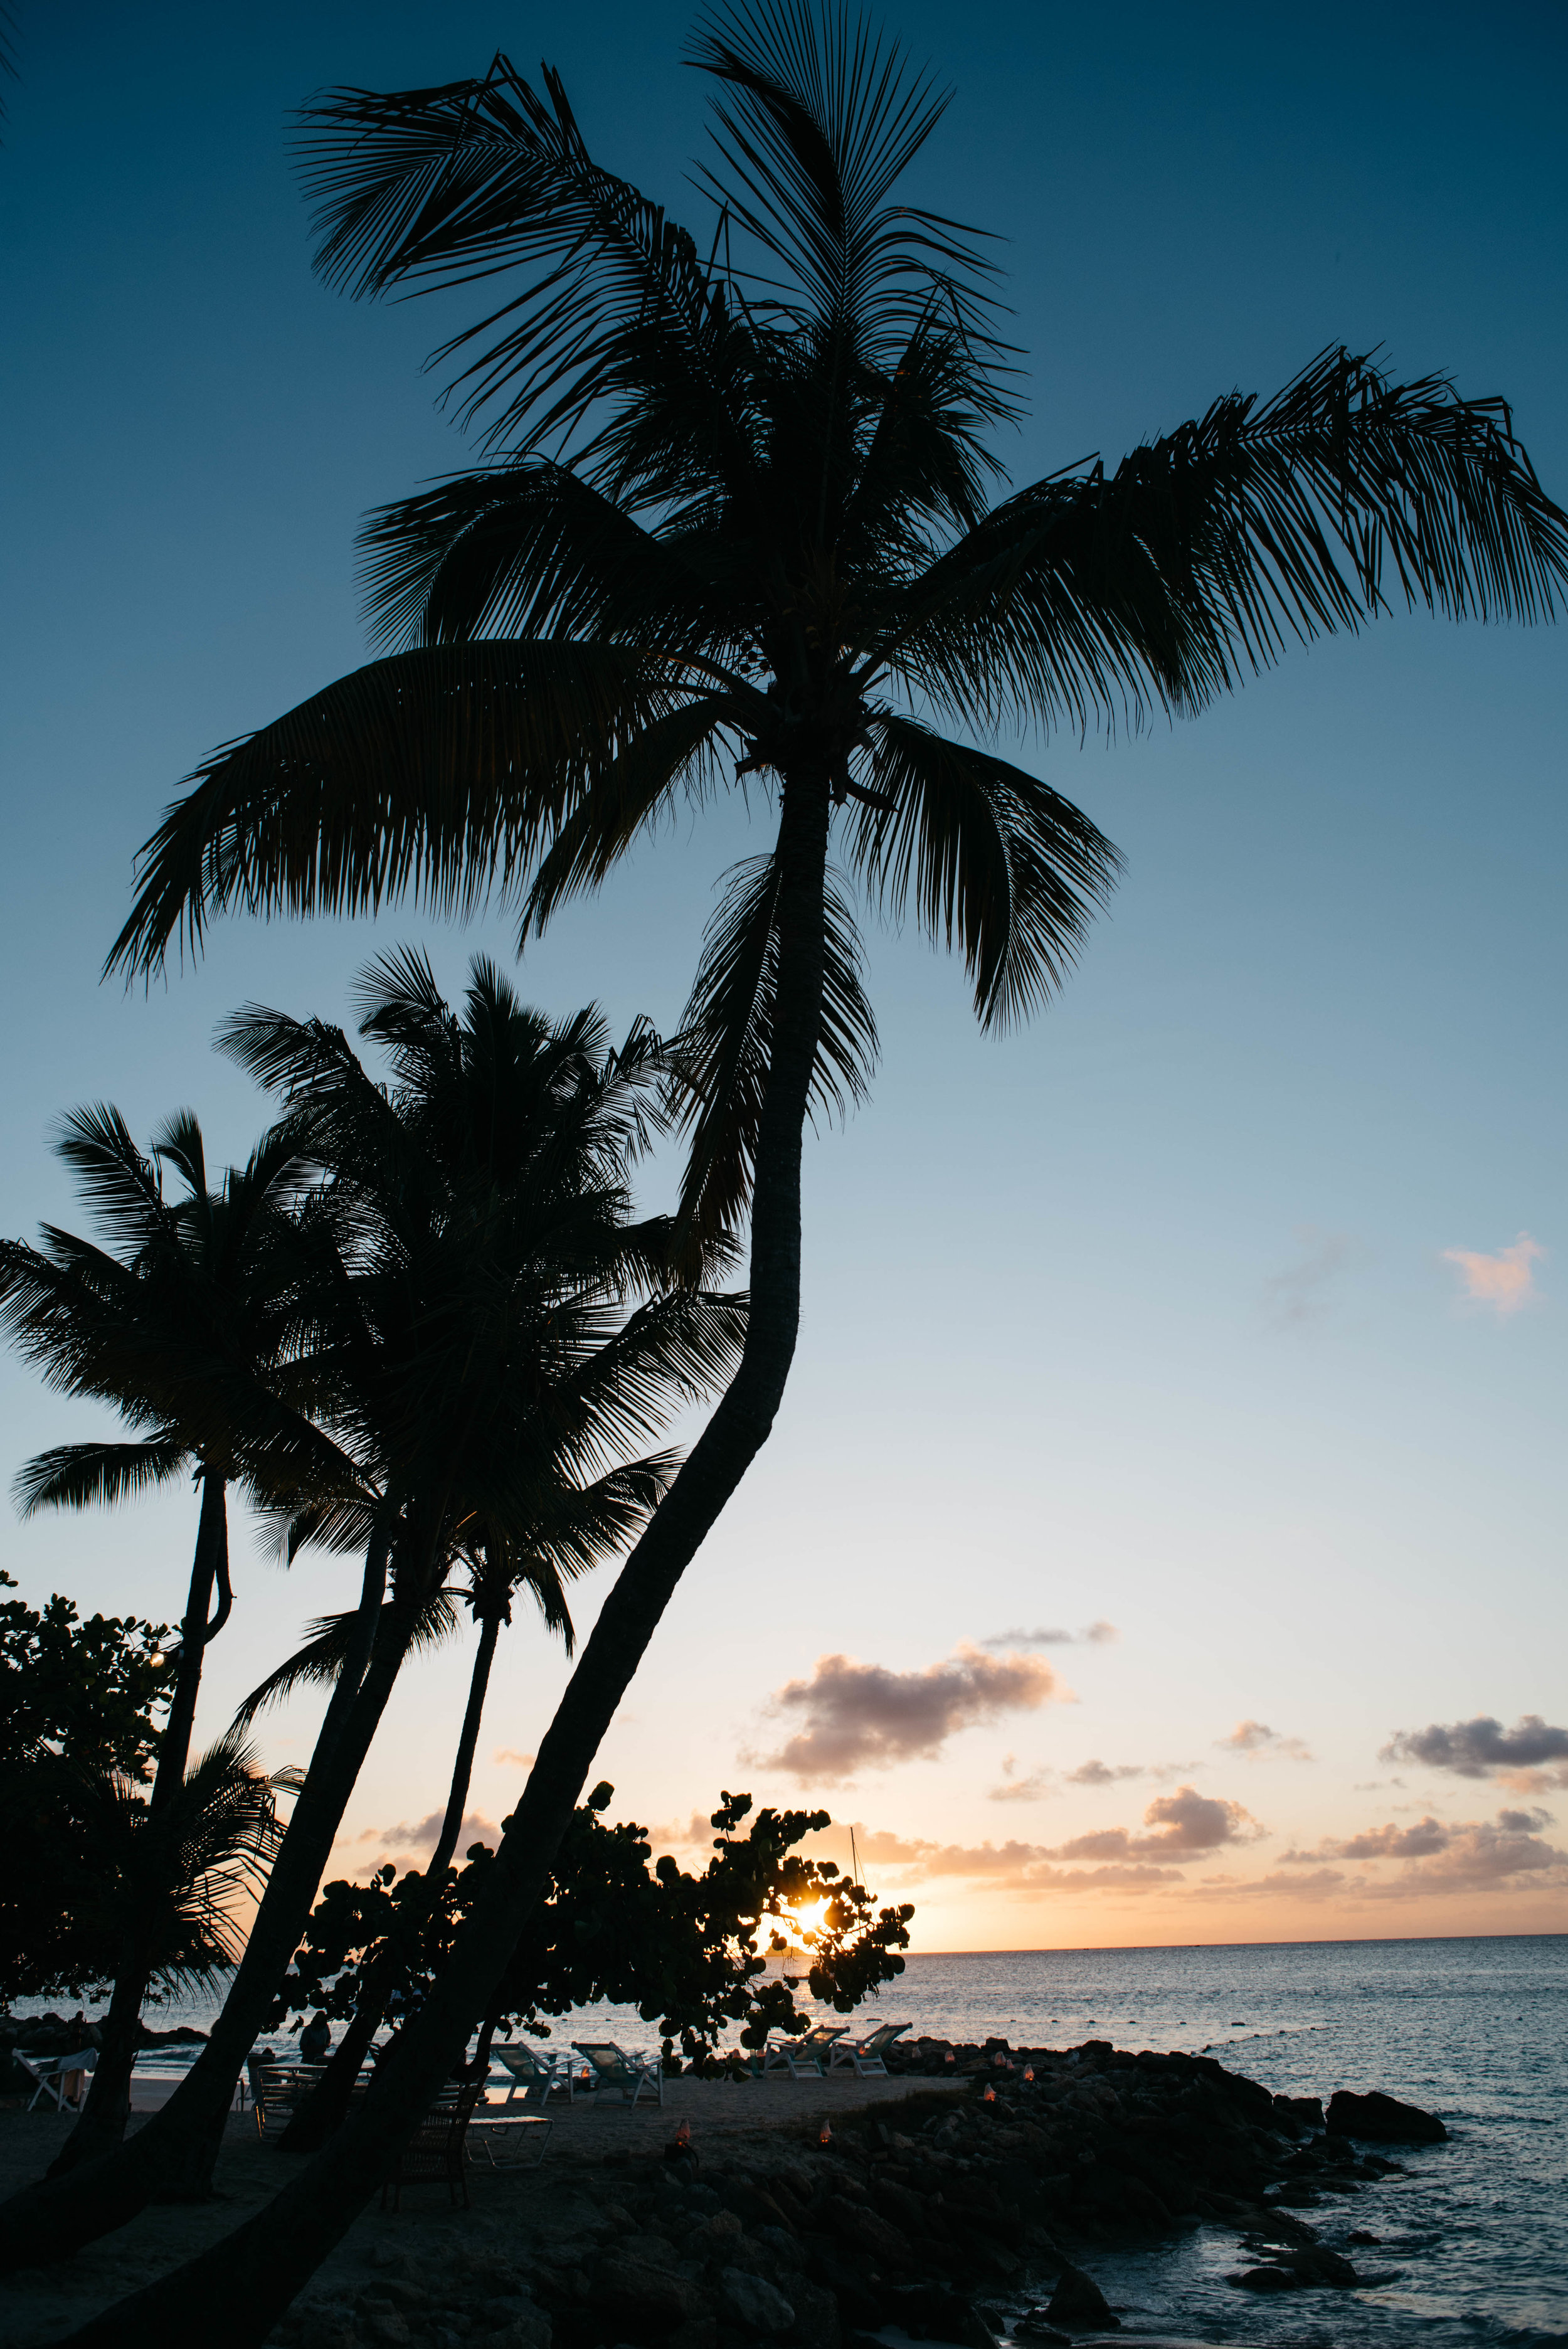 dickenson bay sunset antigua.jpg